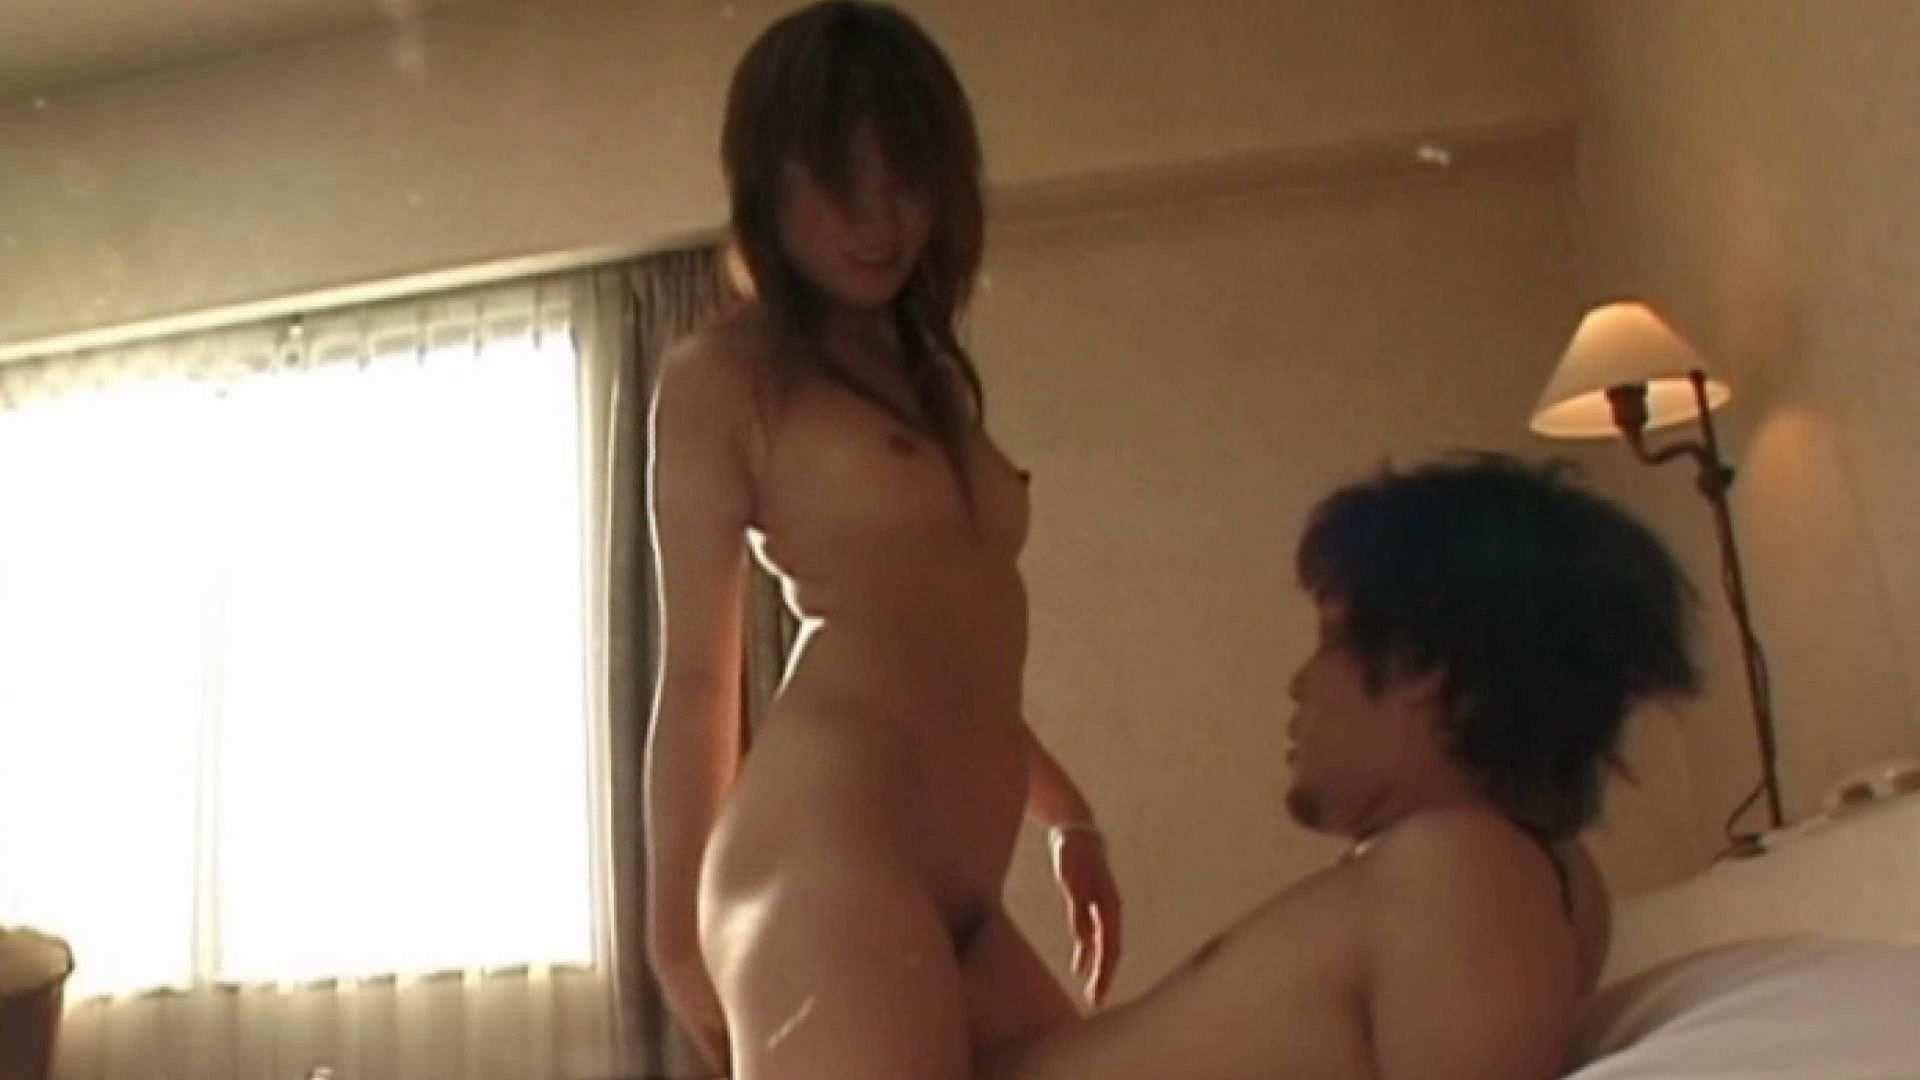 S級厳選美女ビッチガールVol.53 美女丸裸  100pic 9